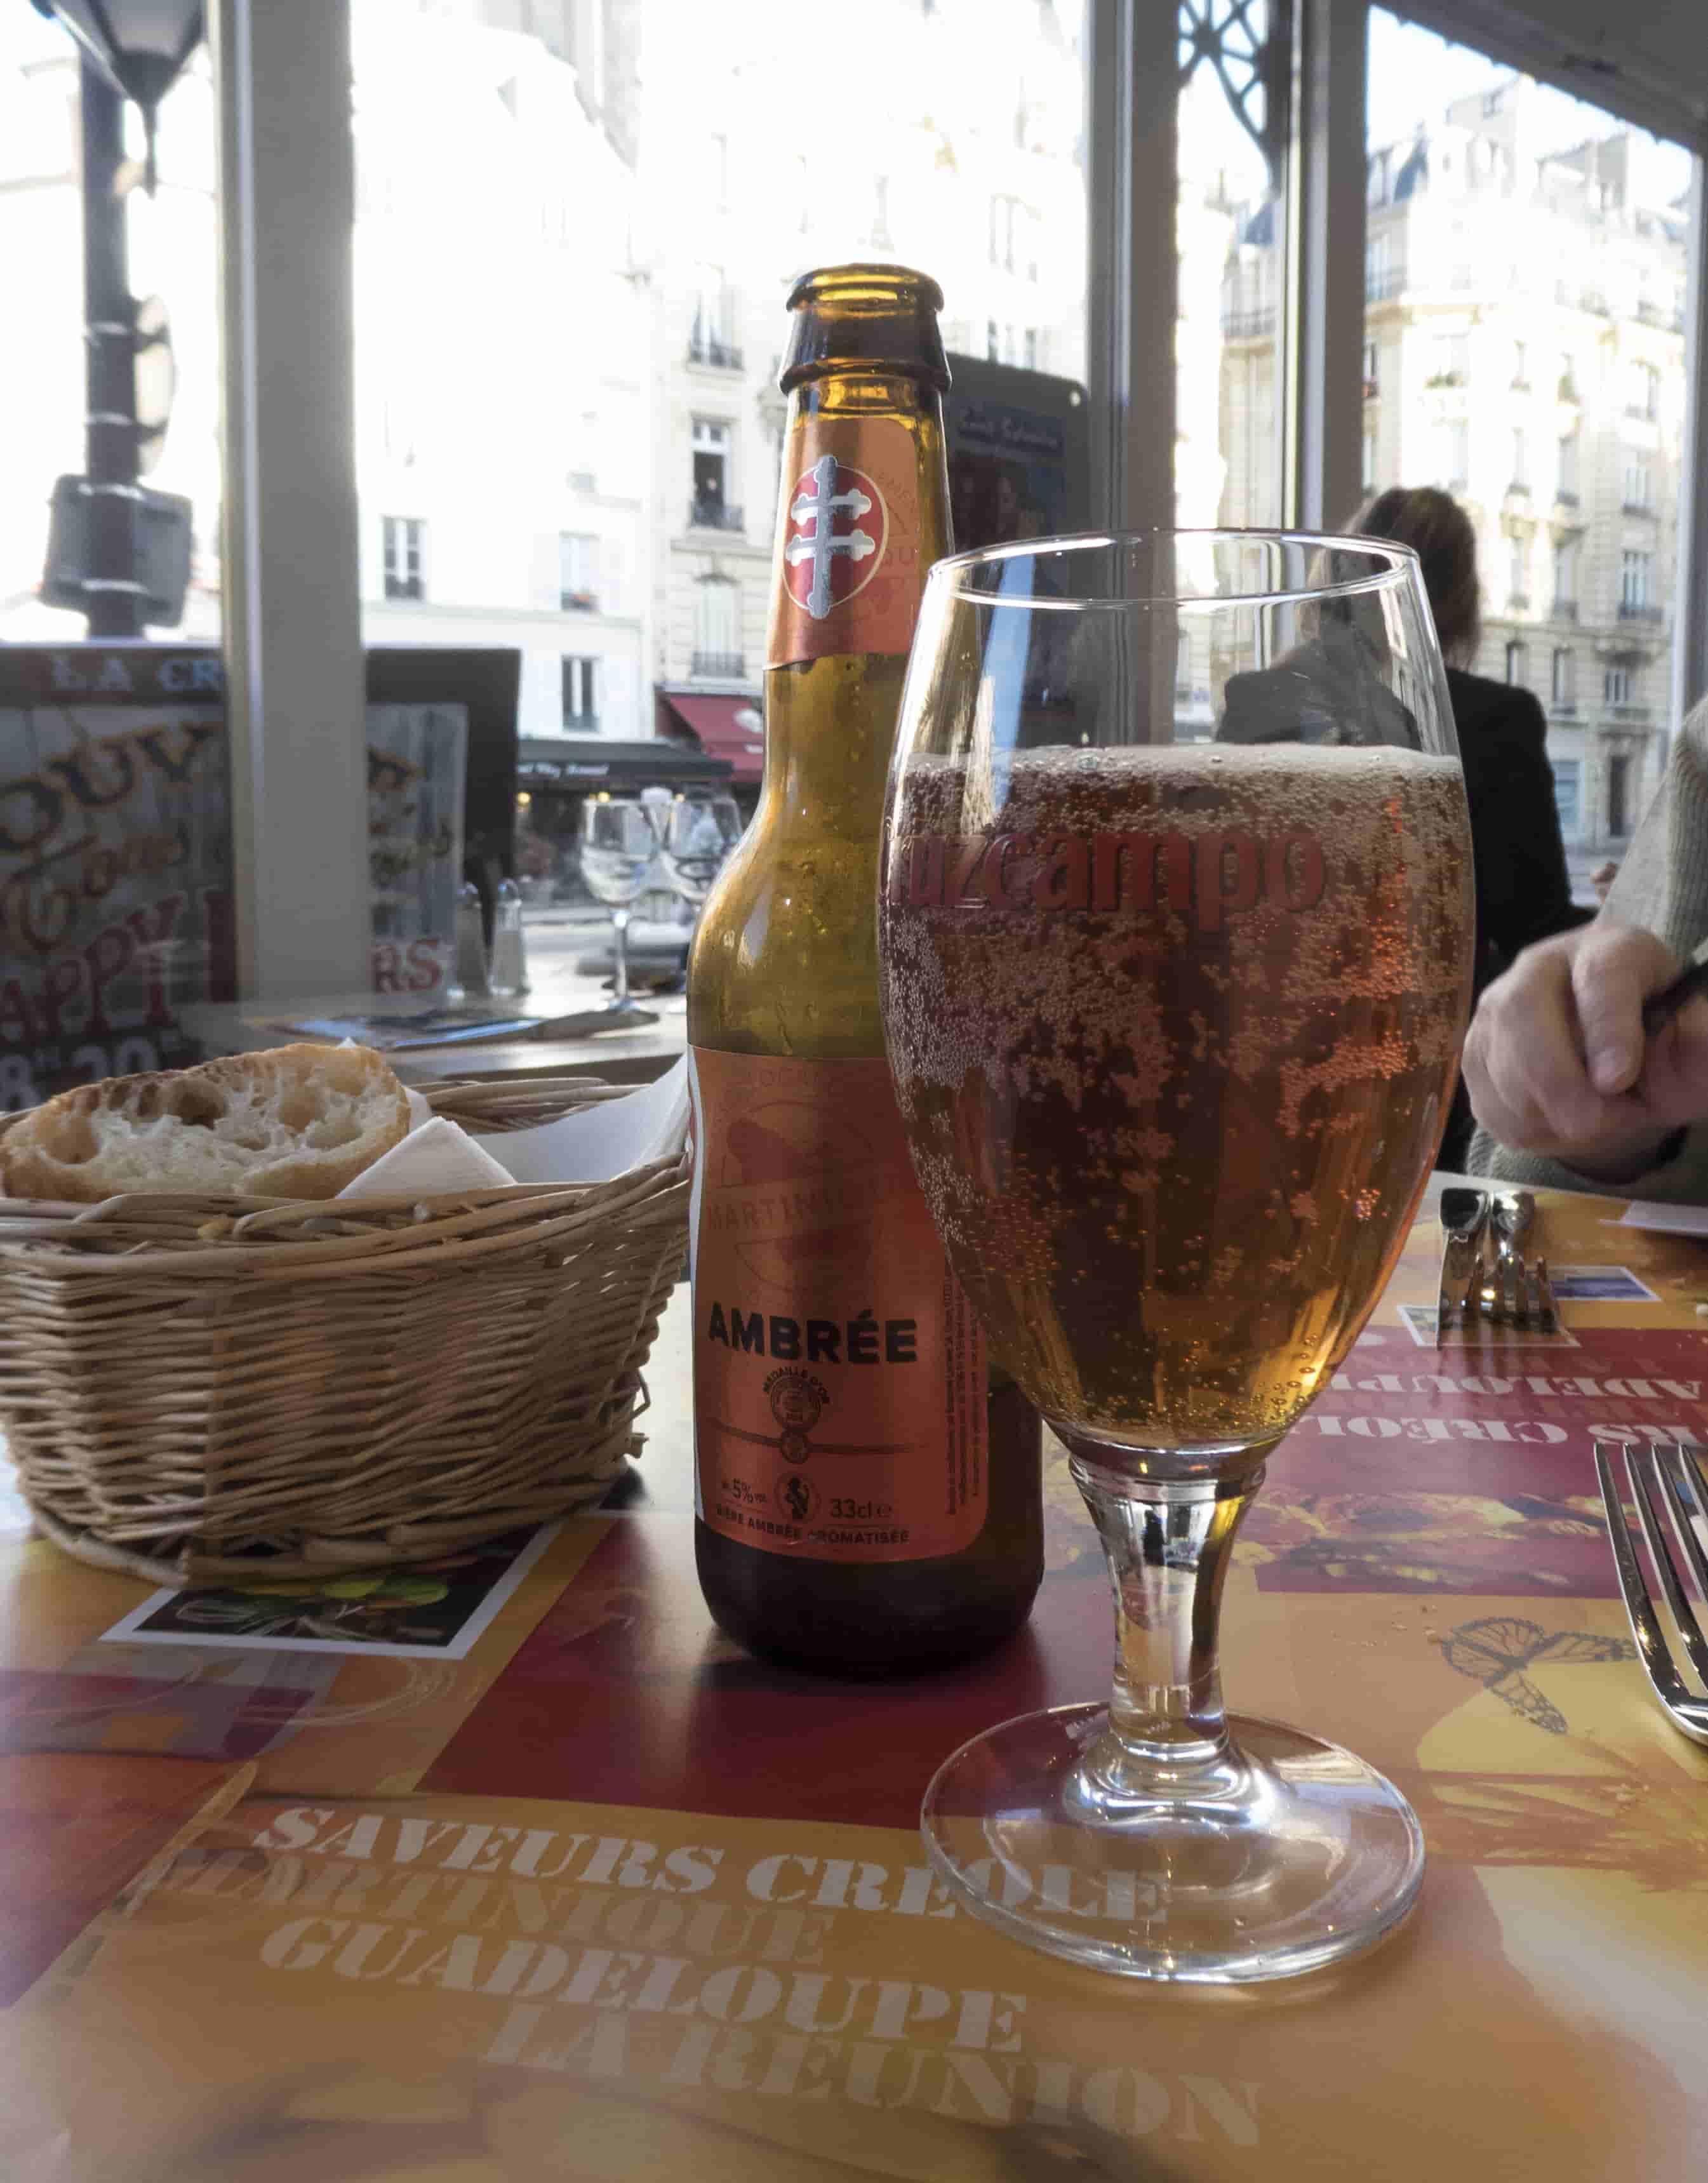 Lorraine Ambré beer